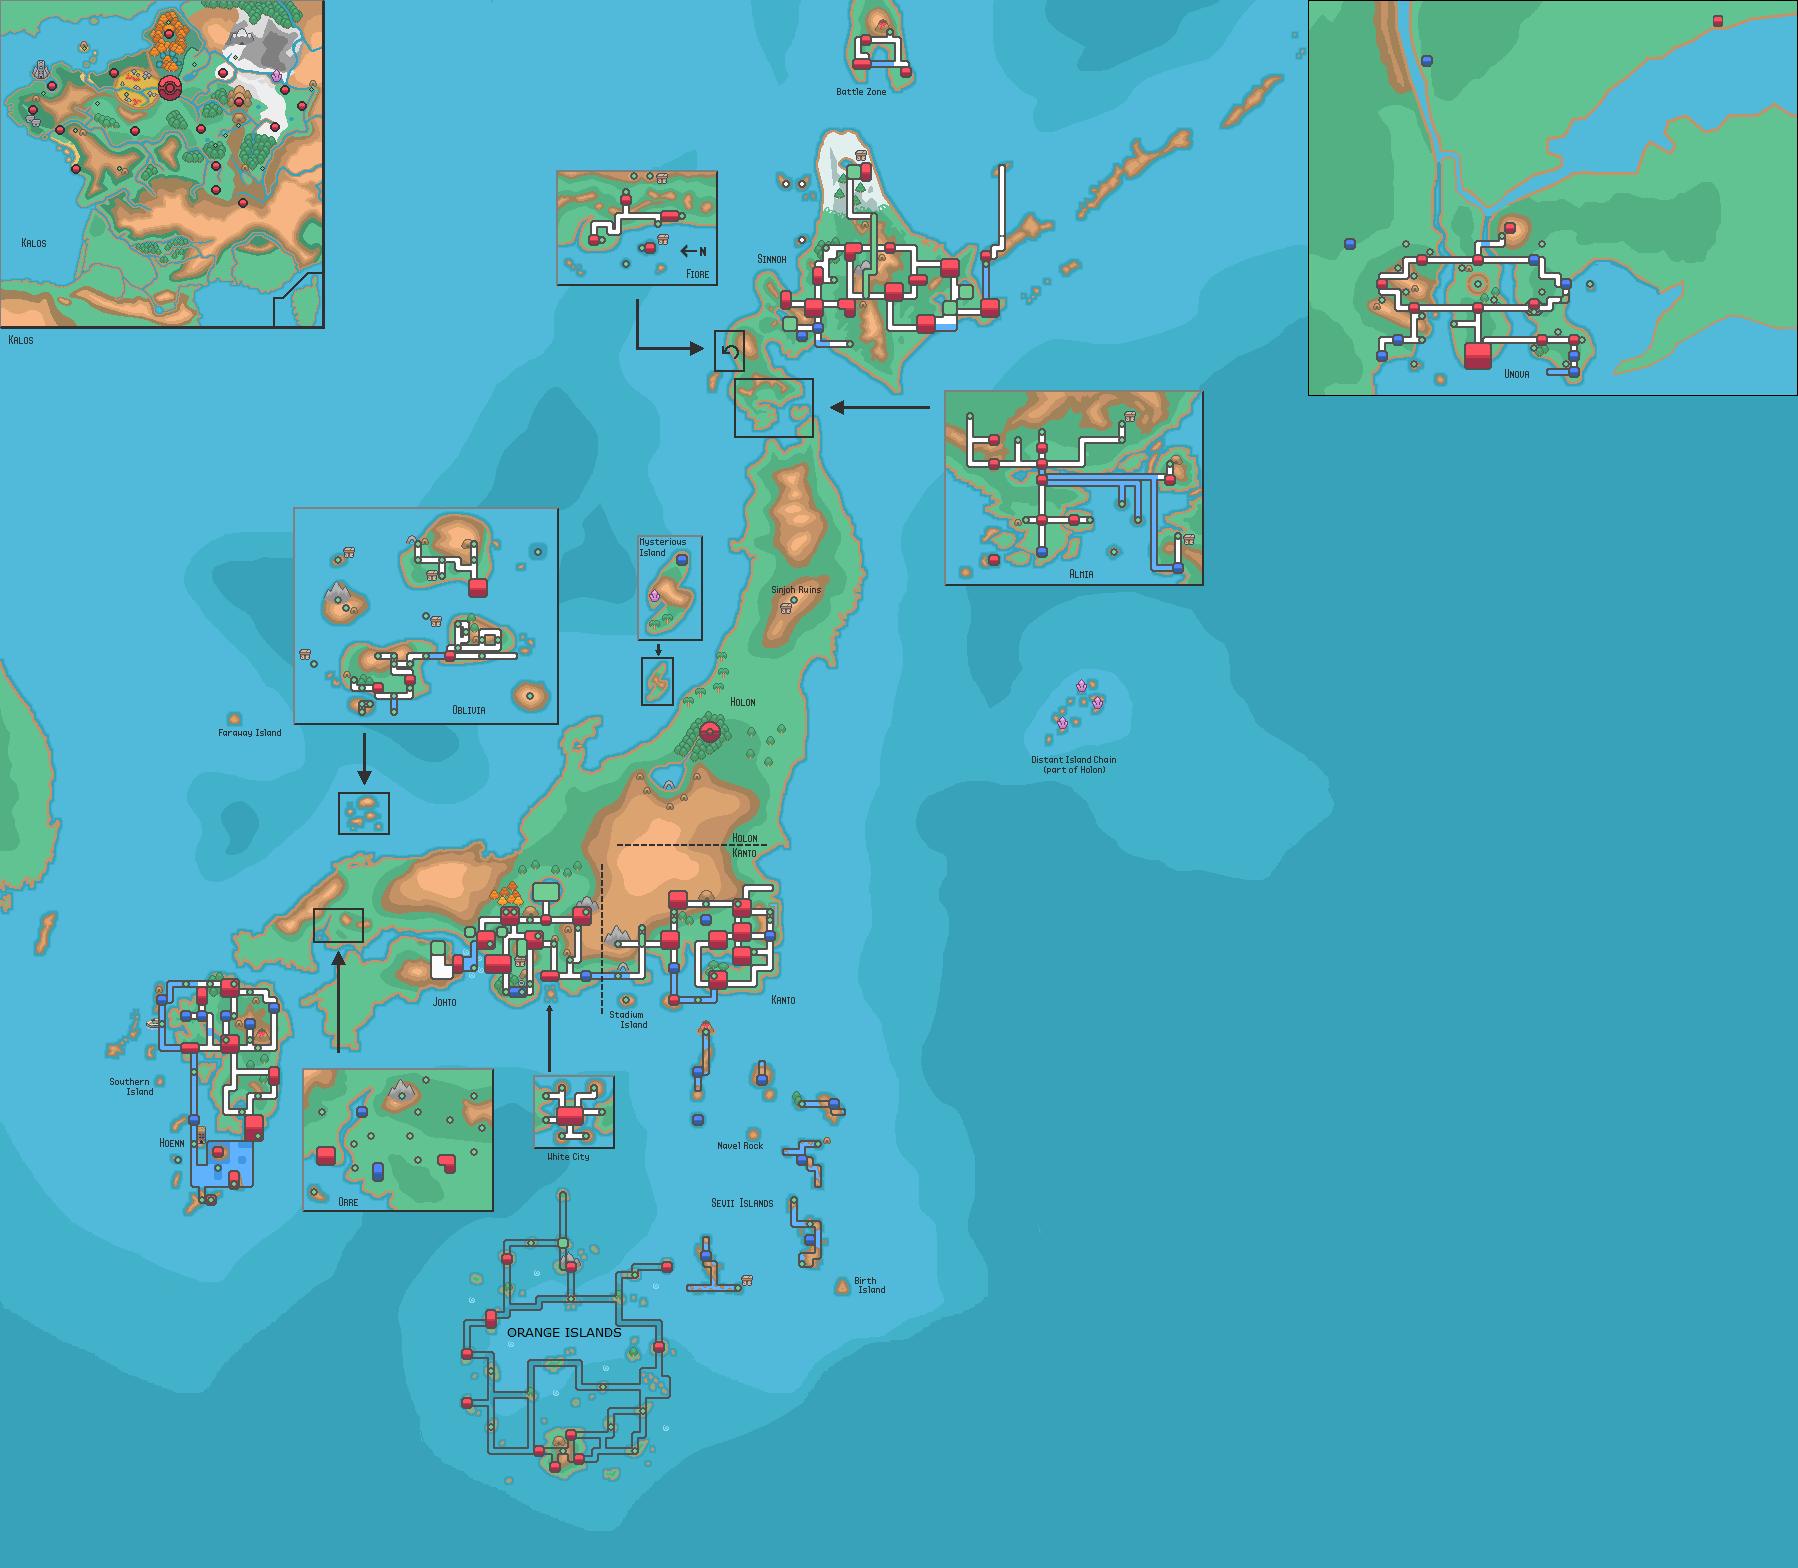 Map of the Pokemon world : pokemon | Maps | Pinterest | Pokémon and ...